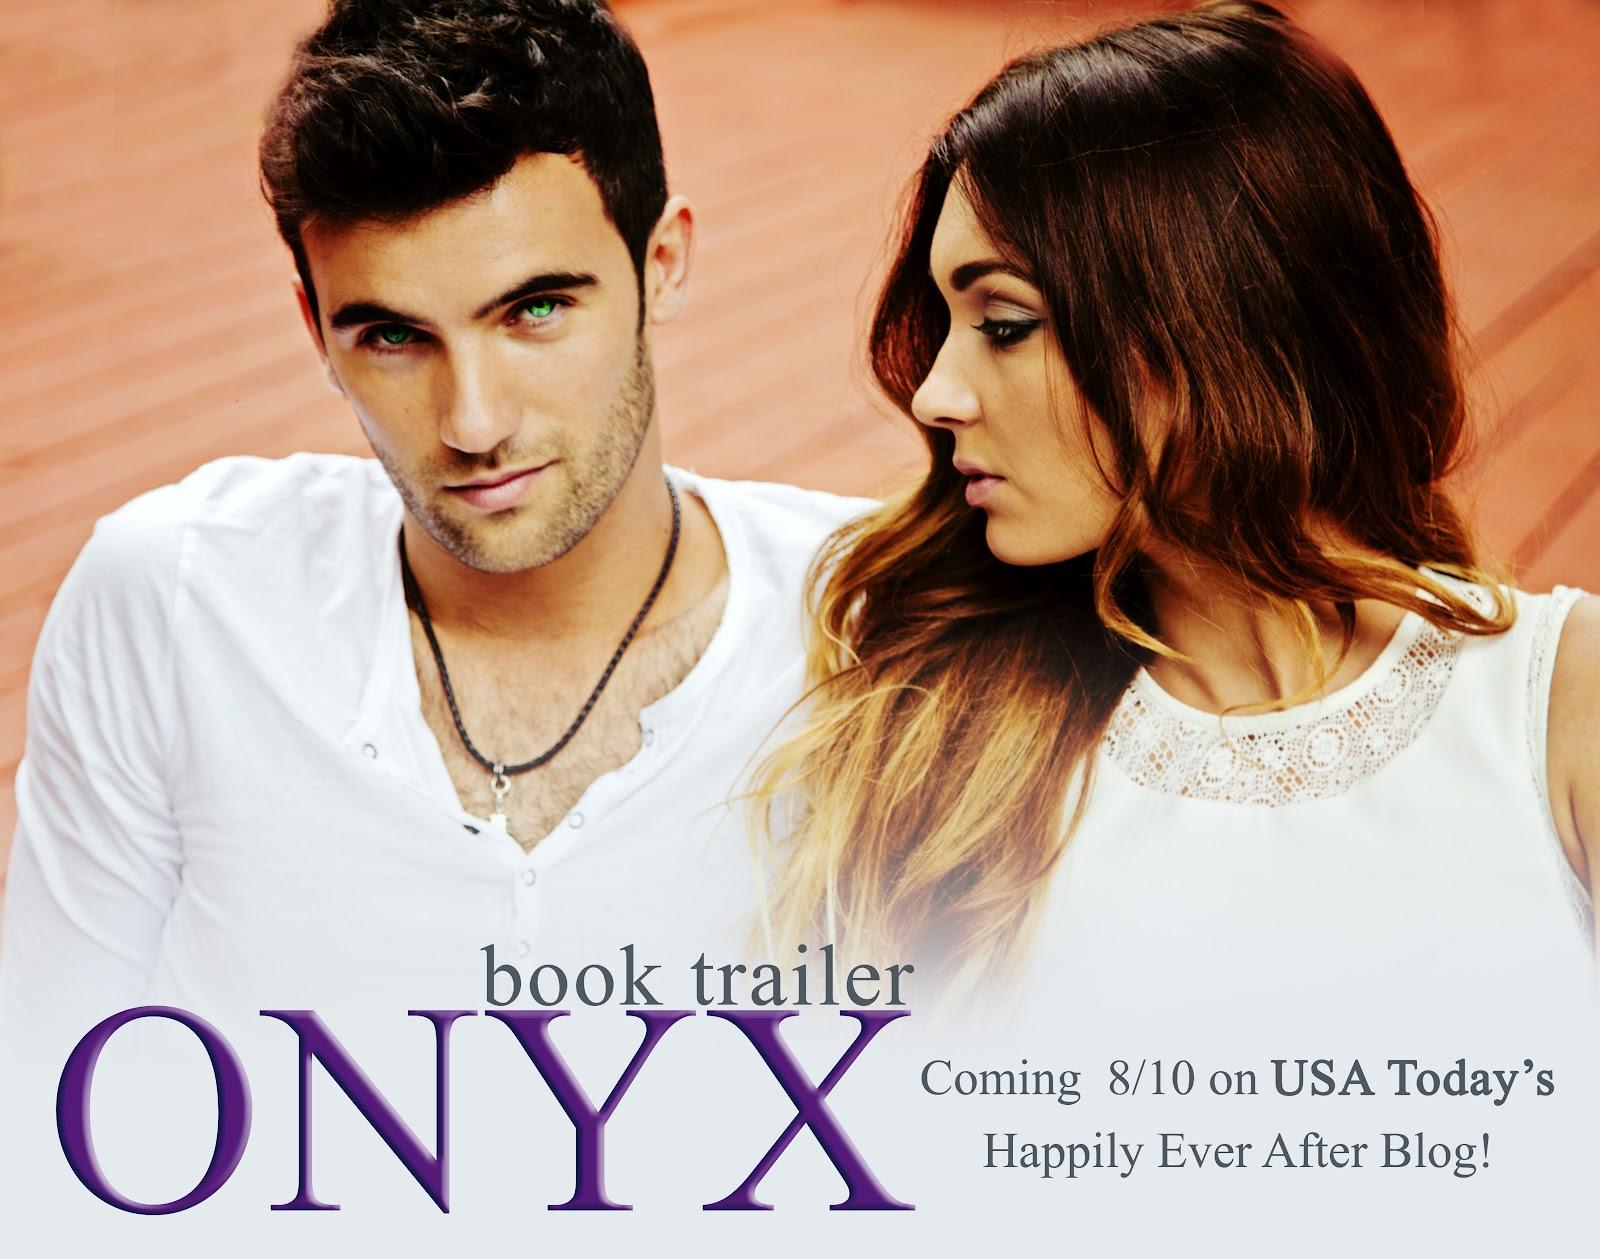 http://3.bp.blogspot.com/-sjUYmXvDF1w/UCUXD1Wz0xI/AAAAAAAAAoc/7iJQueRGnOs/s1600/Onyx+book+trailer.jpg